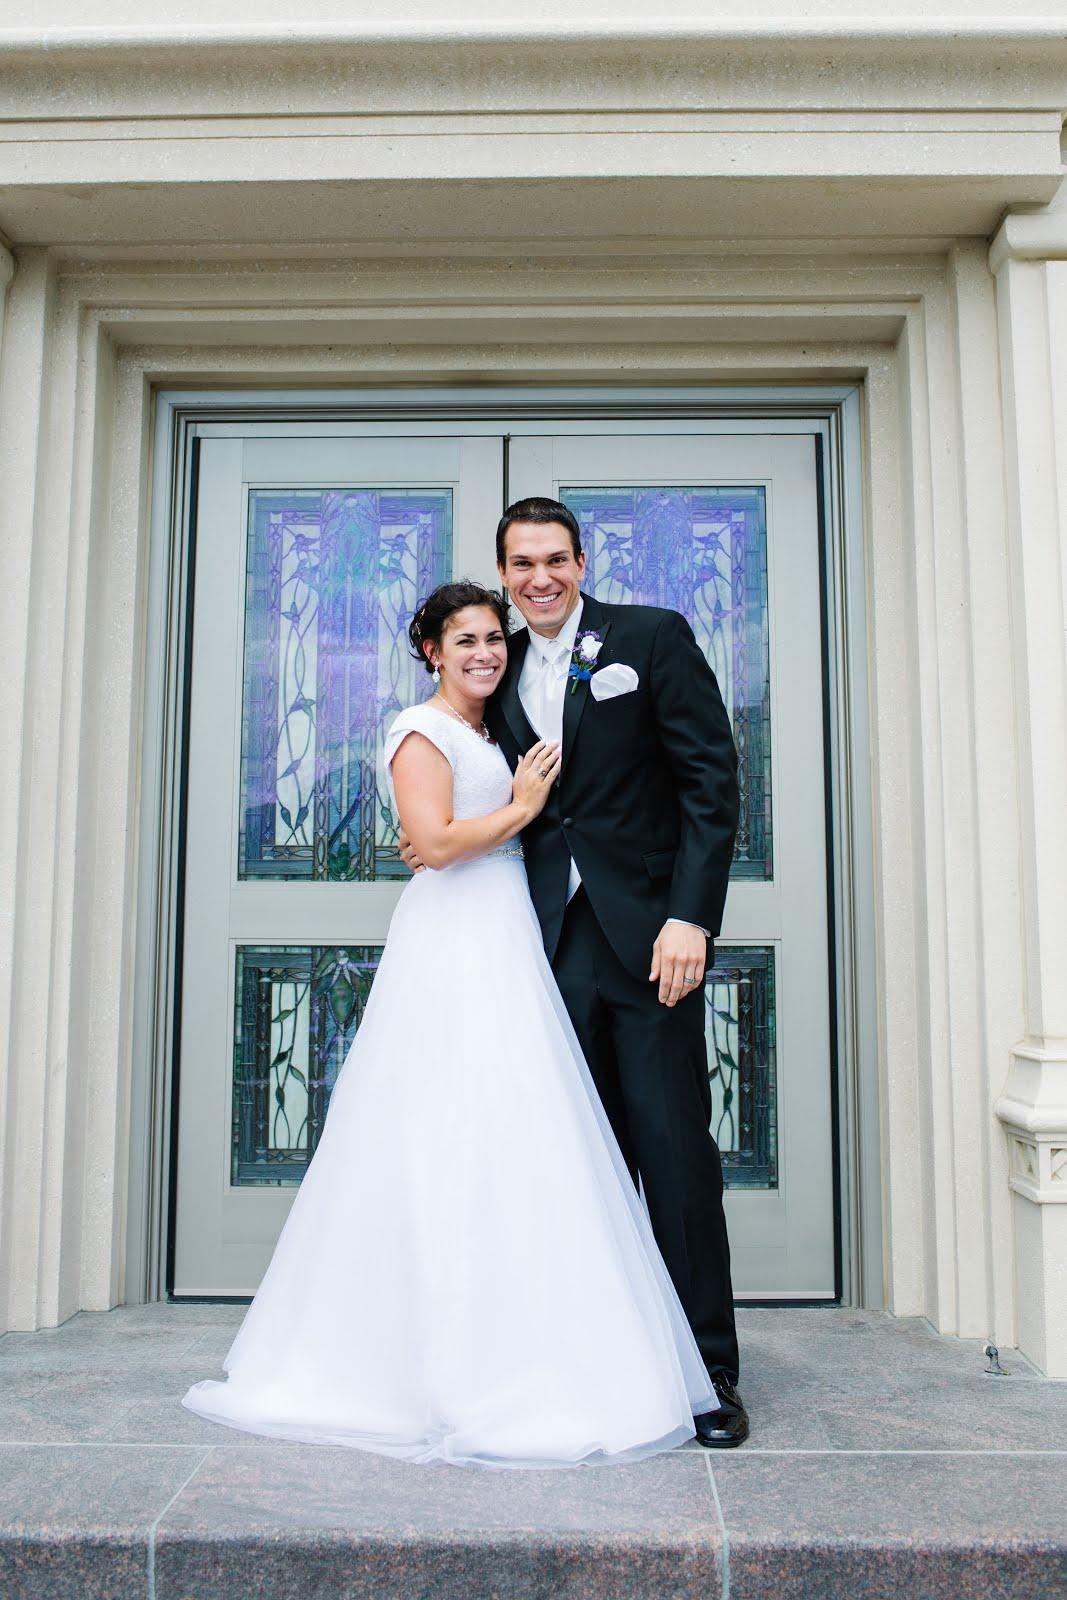 The Running Mormon: My Stargazing Themed Wedding